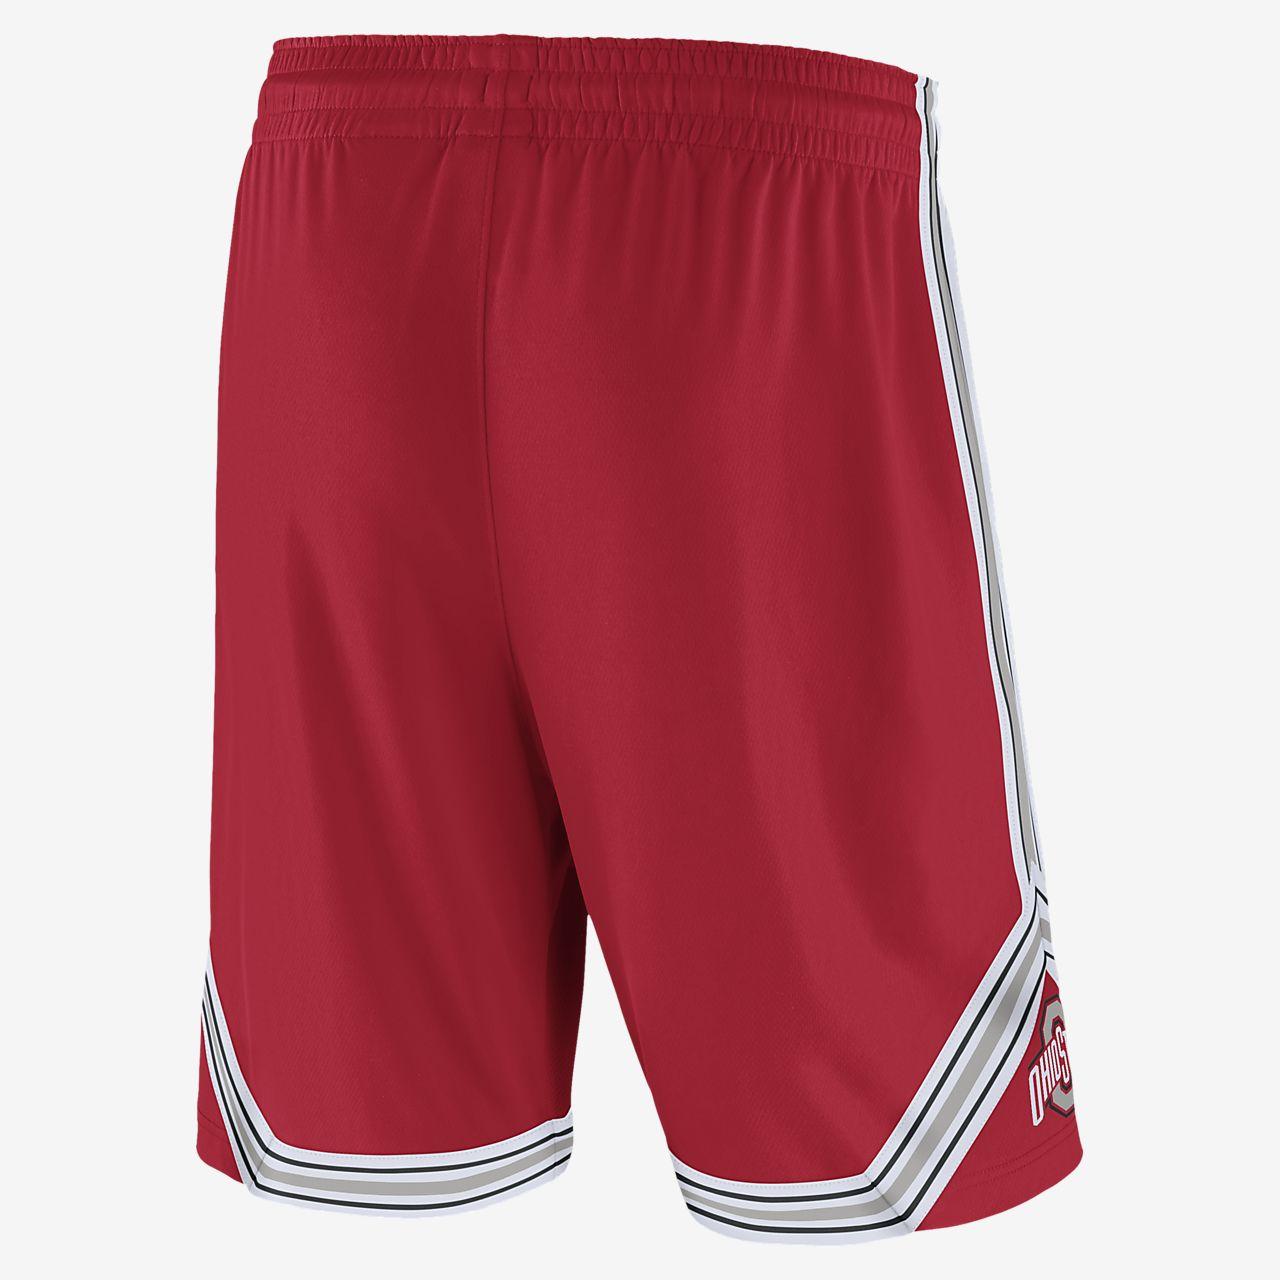 c30f9c3fa064 Nike College Replica (Ohio State) Men s Basketball Shorts. Nike.com